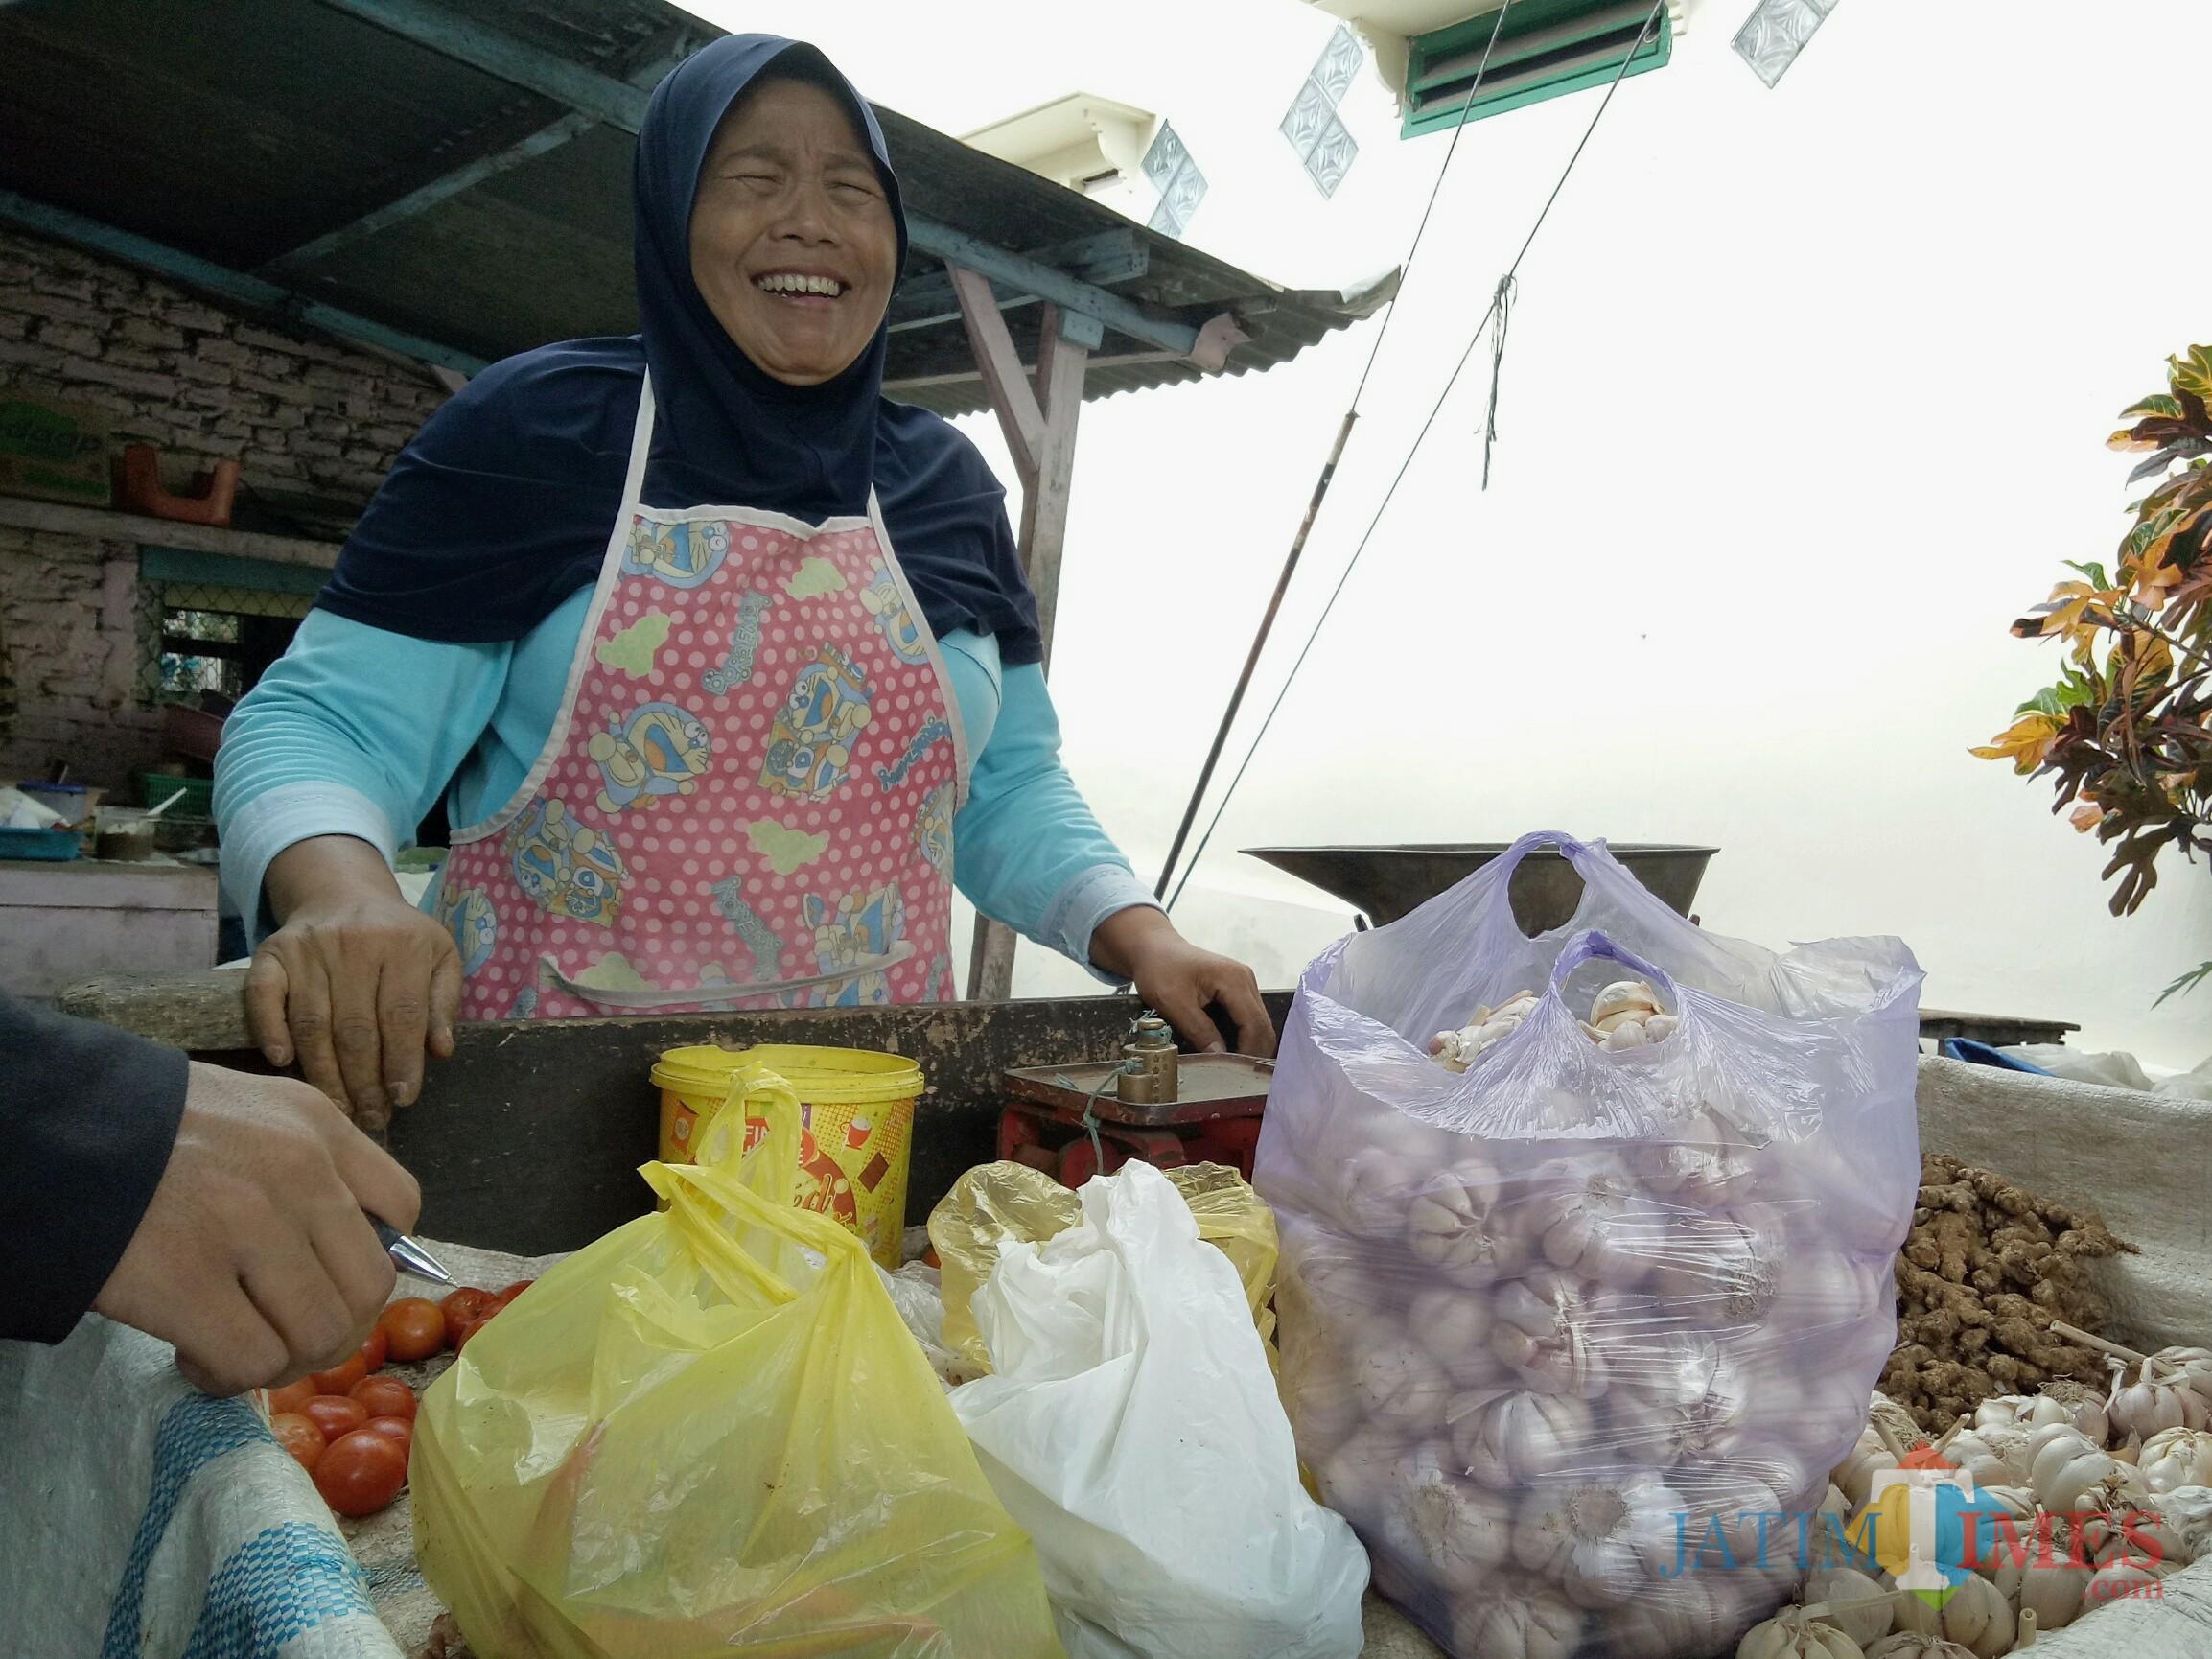 Salah satu pedagang di Pasar Kasin (Foto: Imarotul Izzah/Malang Times)